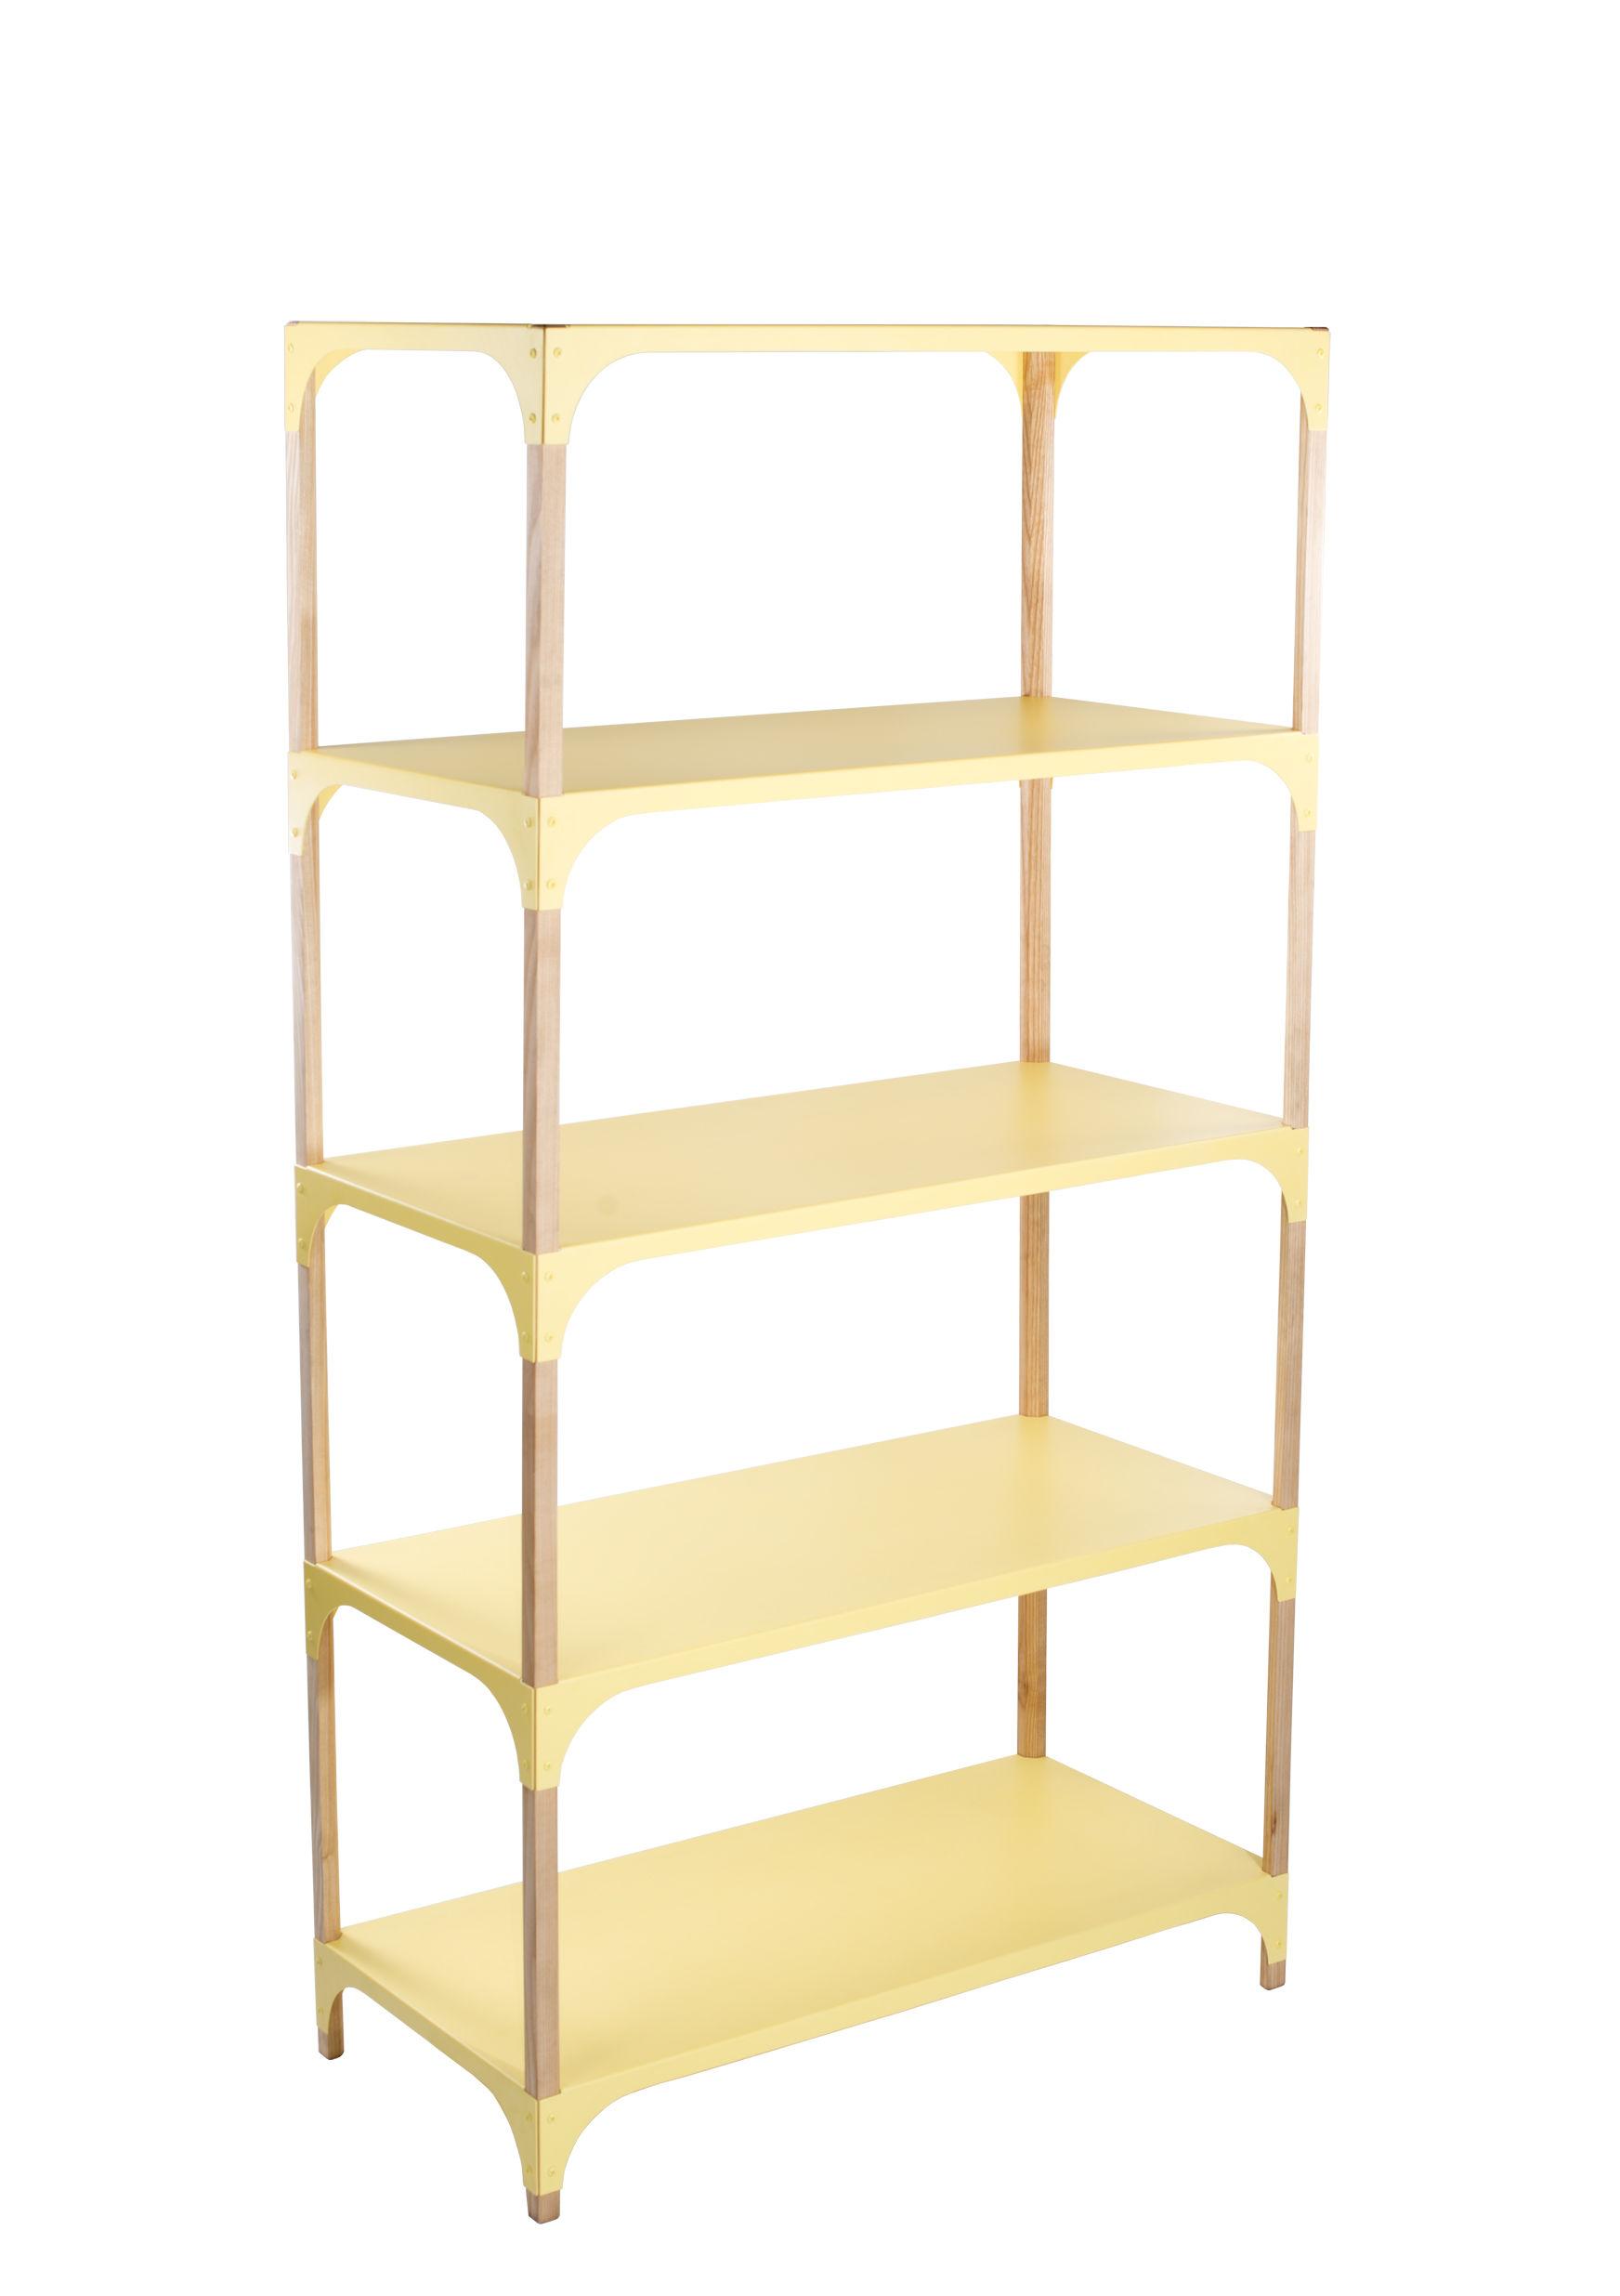 Furniture - Bookcases & Bookshelves - Pop-Up Shelf - / L 85 x H 160 cm by Bibelo - Yellow / Ash - Ashwood, Metal